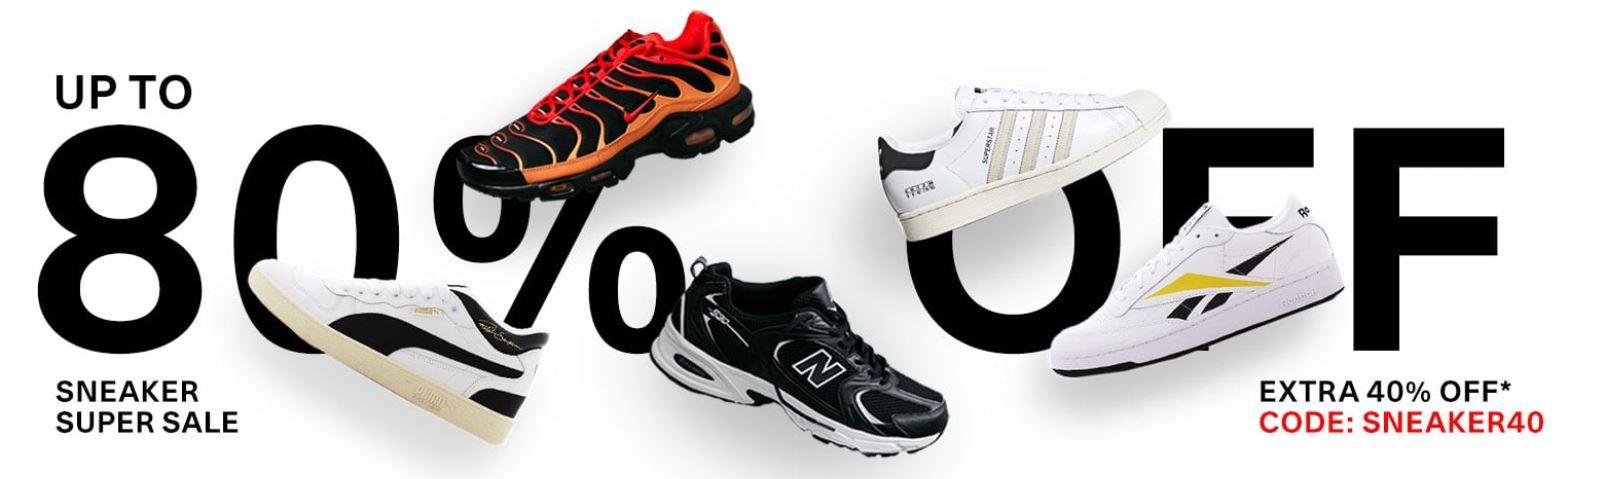 Kickz Sneaker Super Sale + 40% Extra Rabatt z.B. Converse Chuck 70OX für 26,99€ (statt 42€)